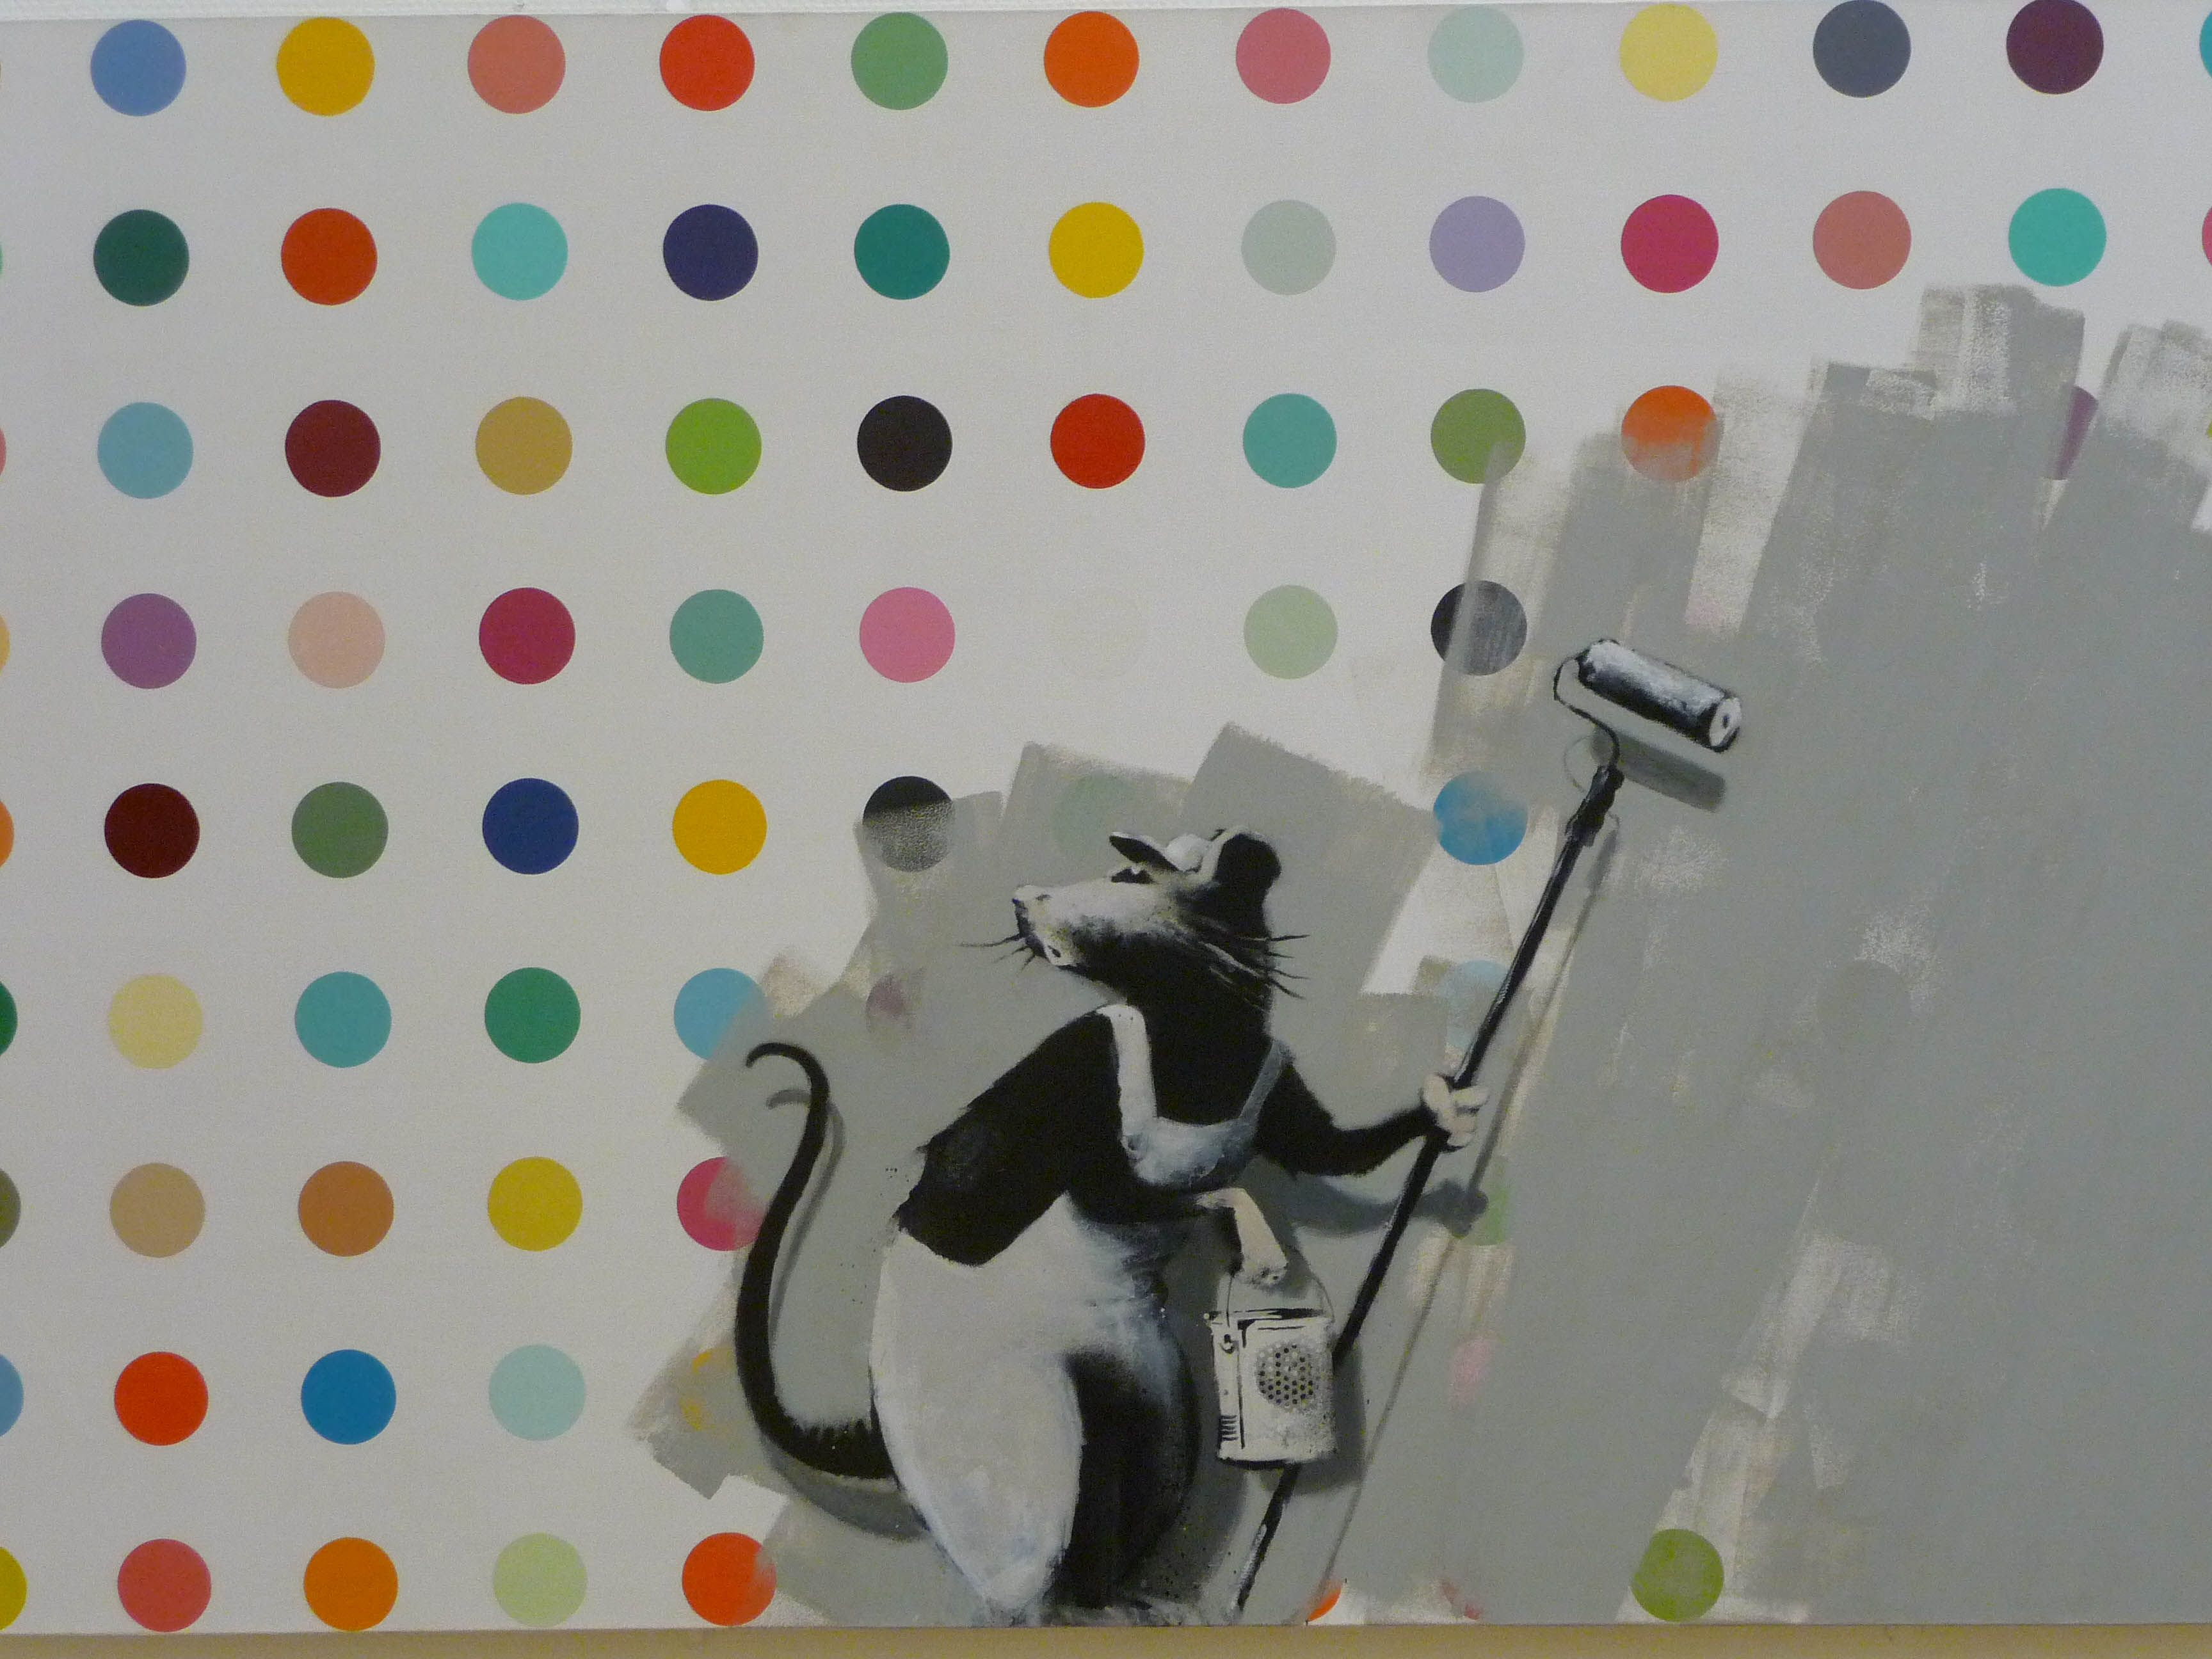 Banksy 'improves' Damien Hirst's LSD